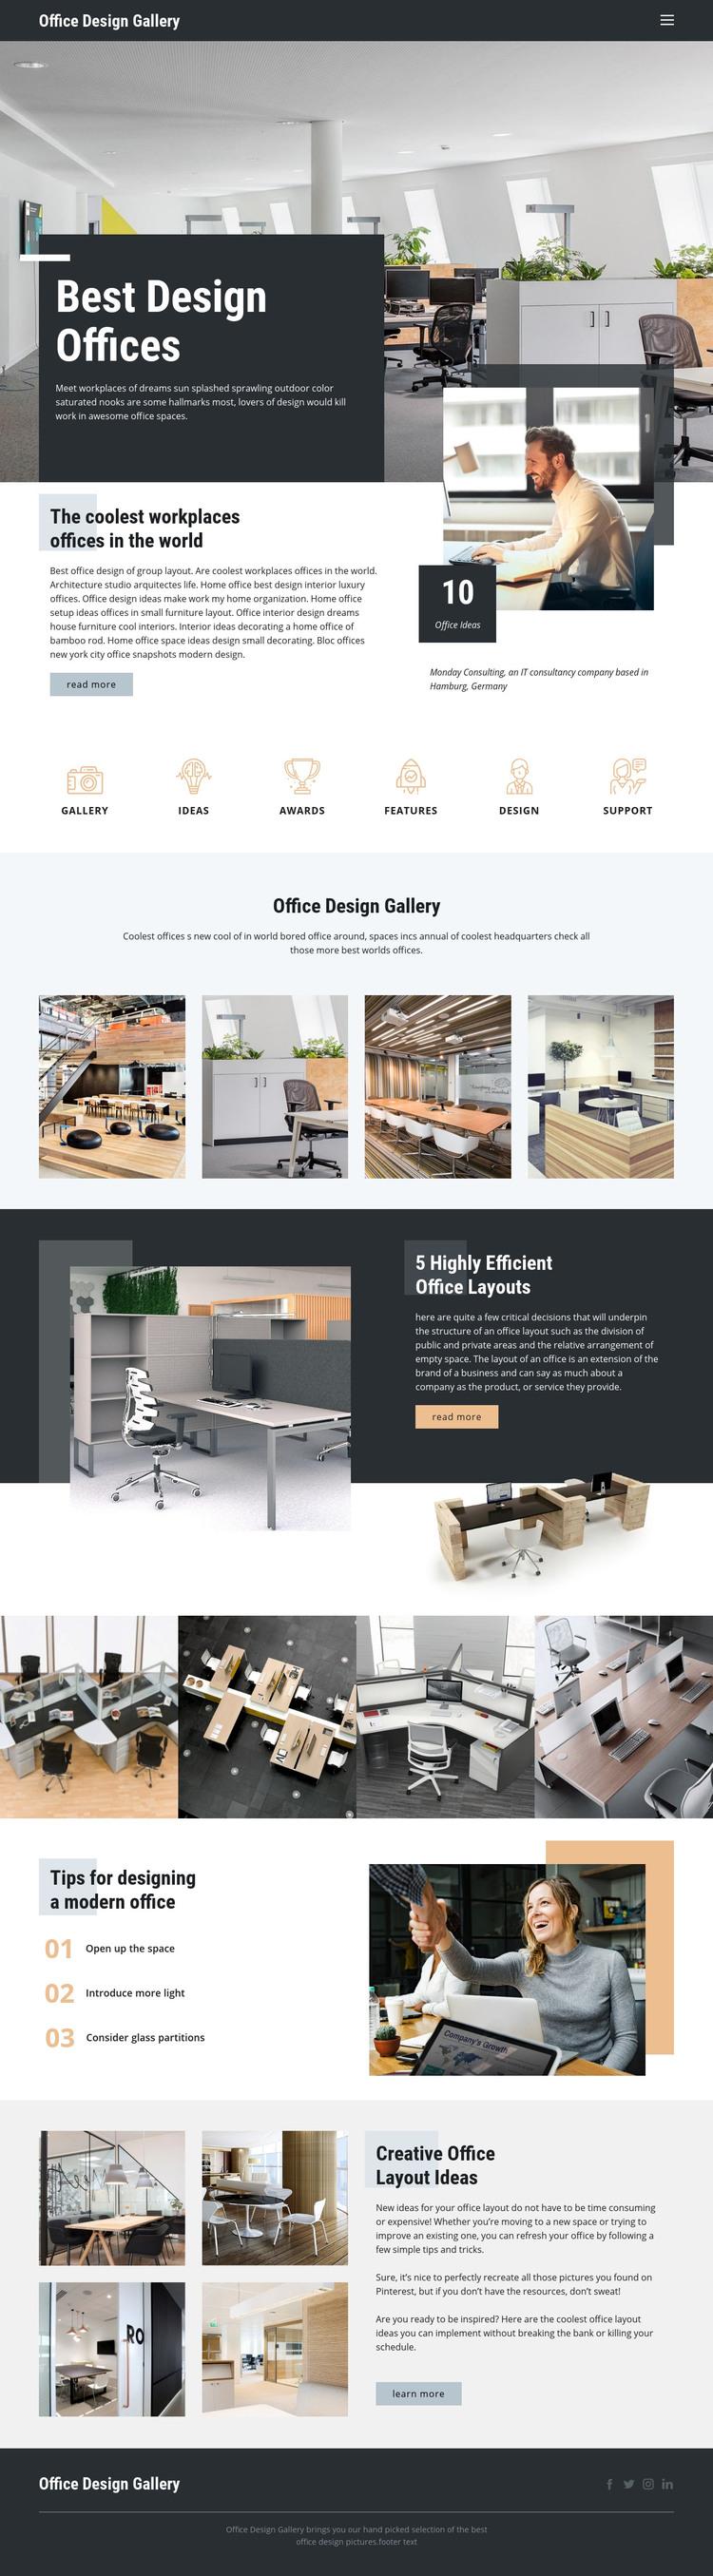 Best Design Offices Homepage Design